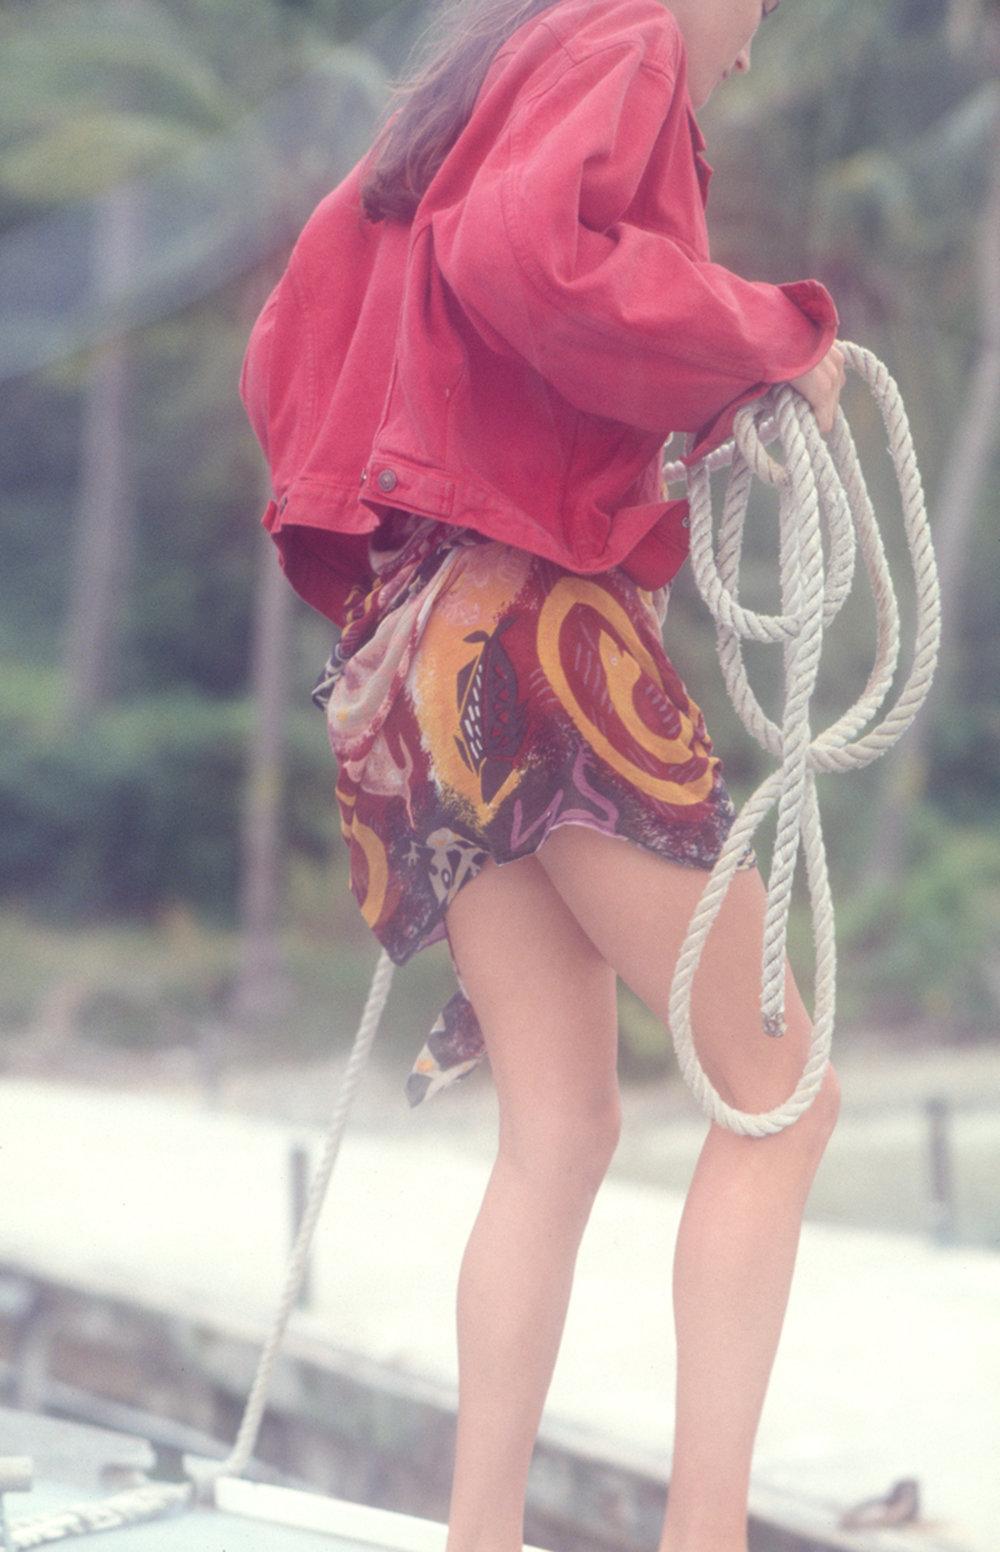 Jessica-rope.jpg